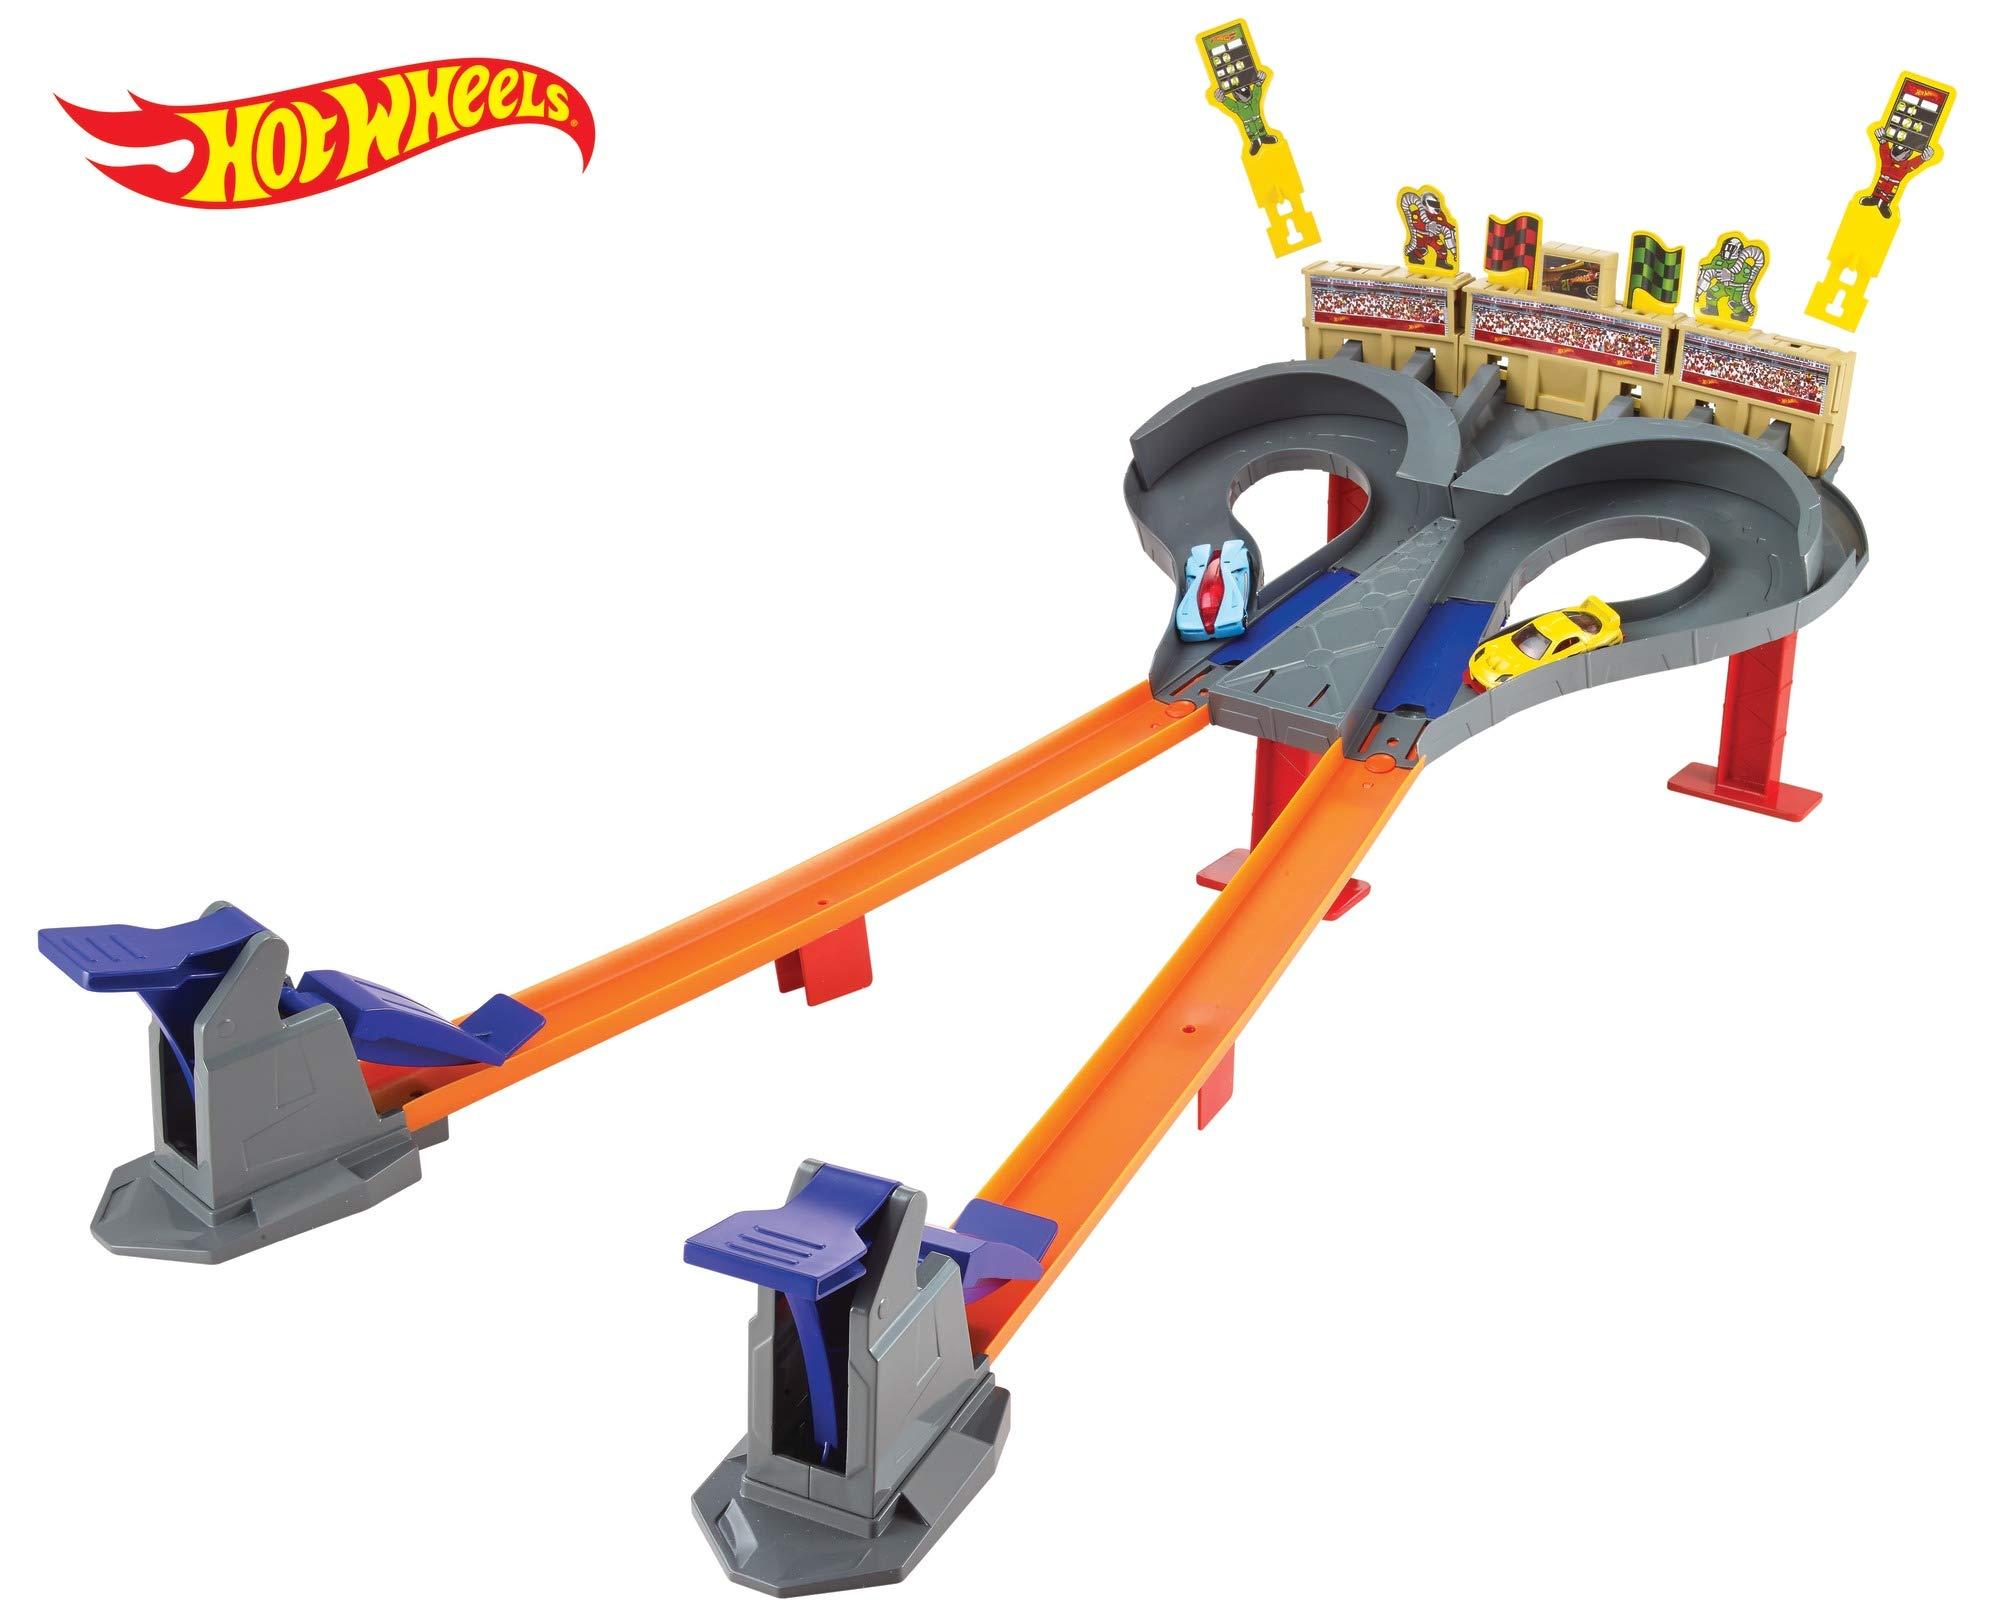 Hot Wheels Super Speed Blastway Track Set [Amazon Exclusive] by Hot Wheels